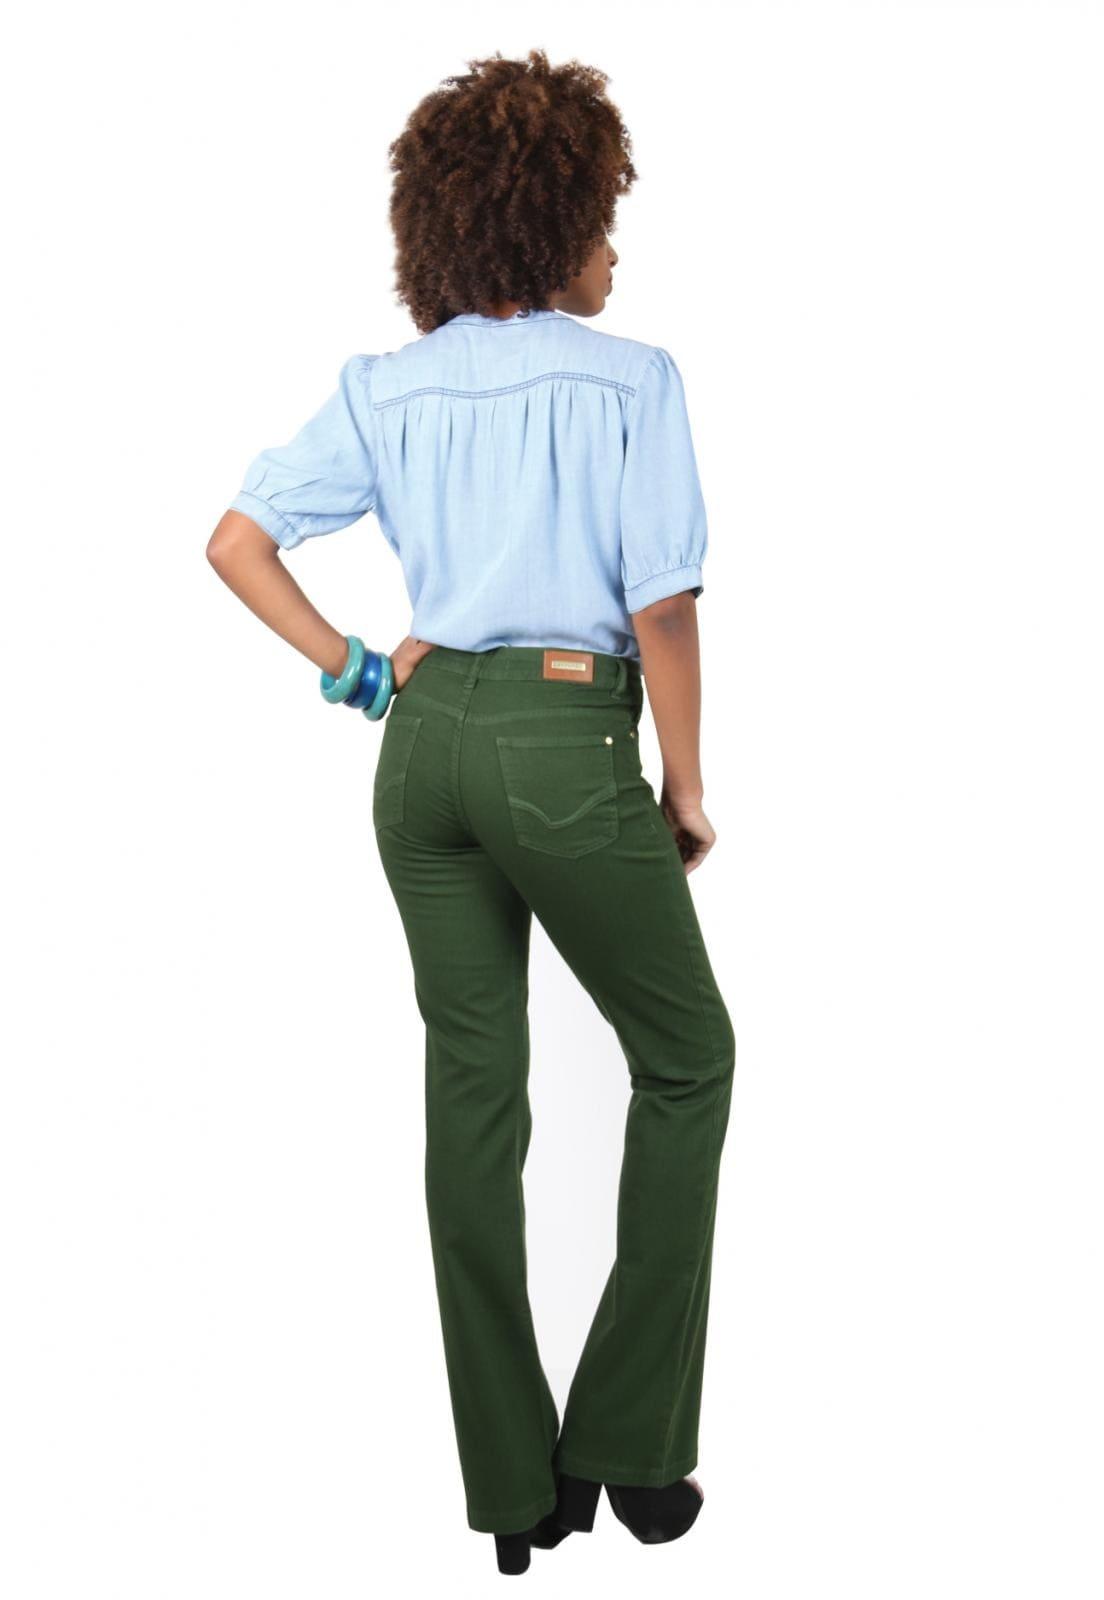 Blusa Jeans Latifundio com Botão